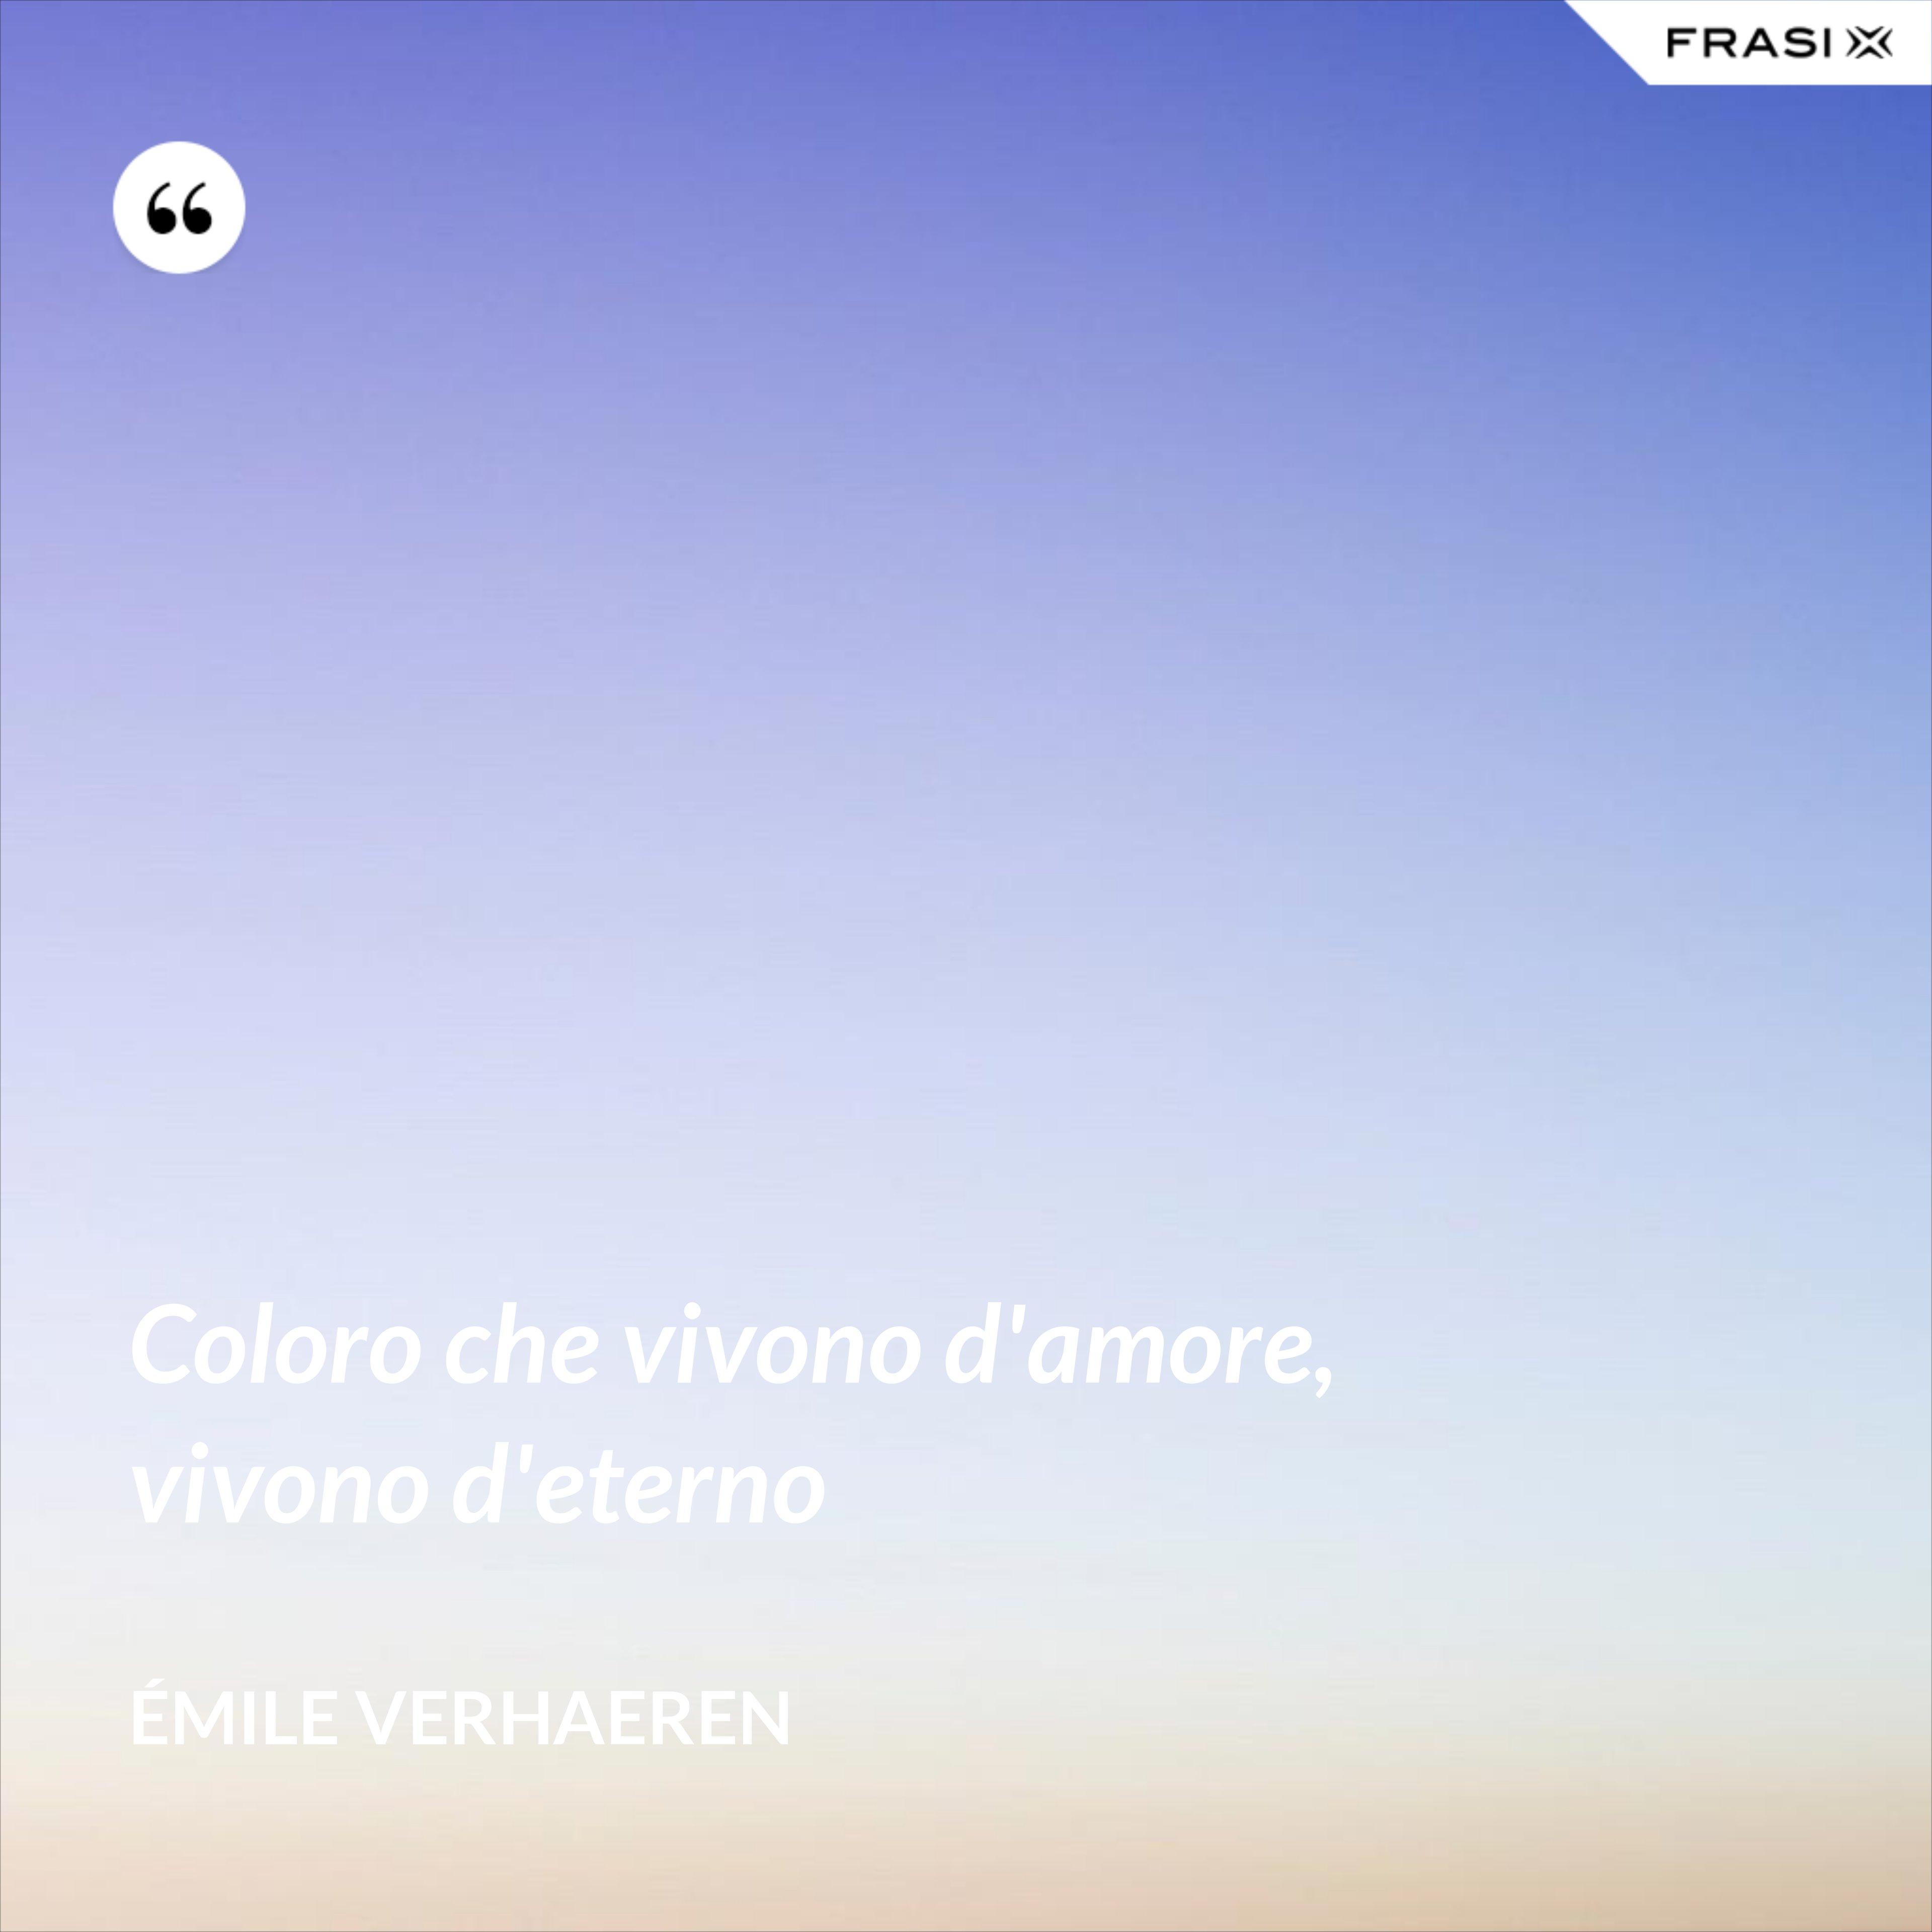 Coloro che vivono d'amore, vivono d'eterno - Émile Verhaeren